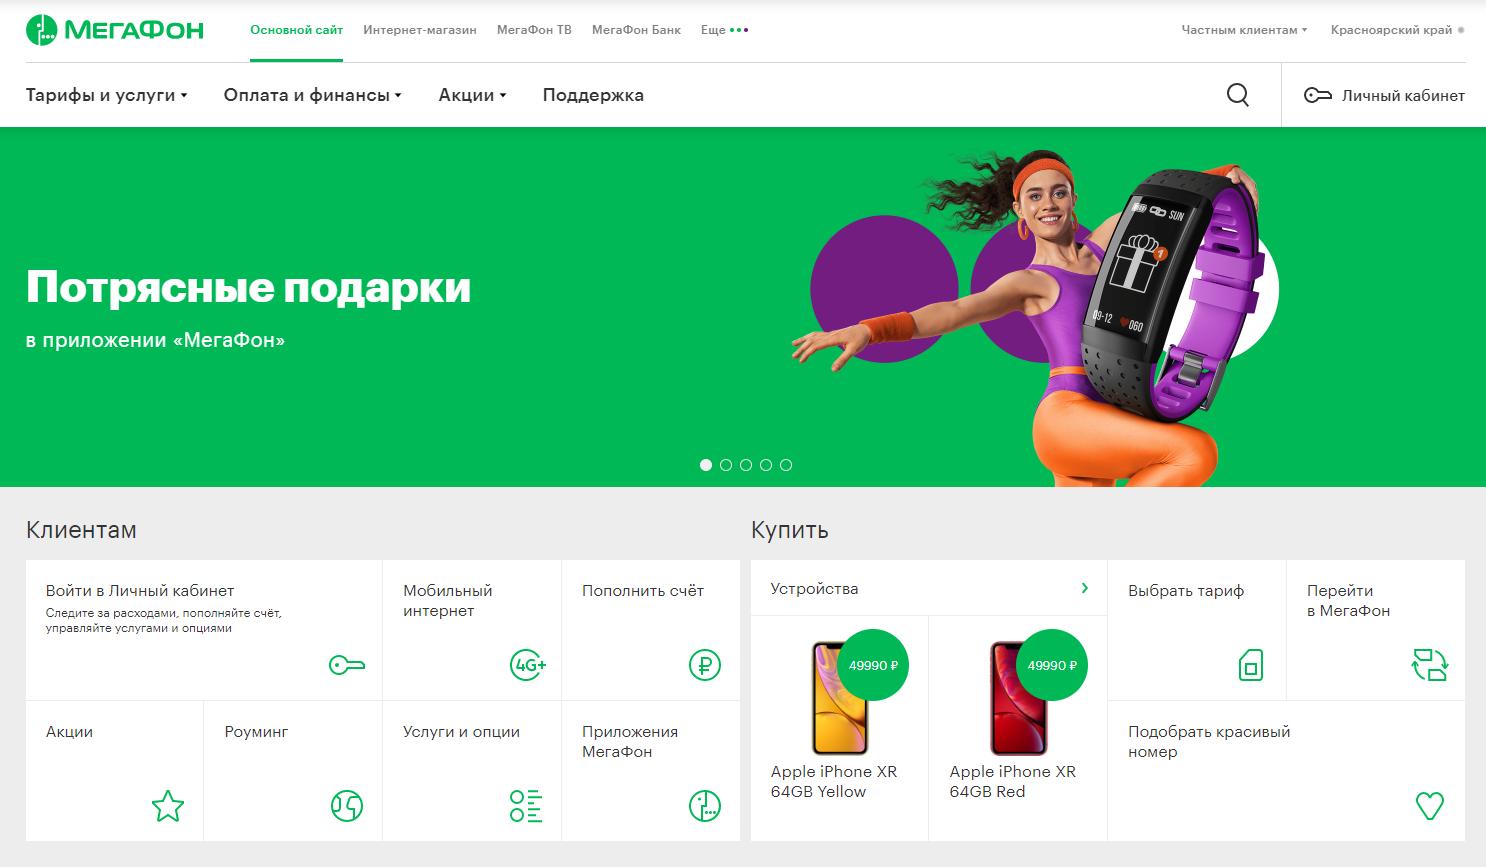 site-megafon-krasnoyarsk2.png